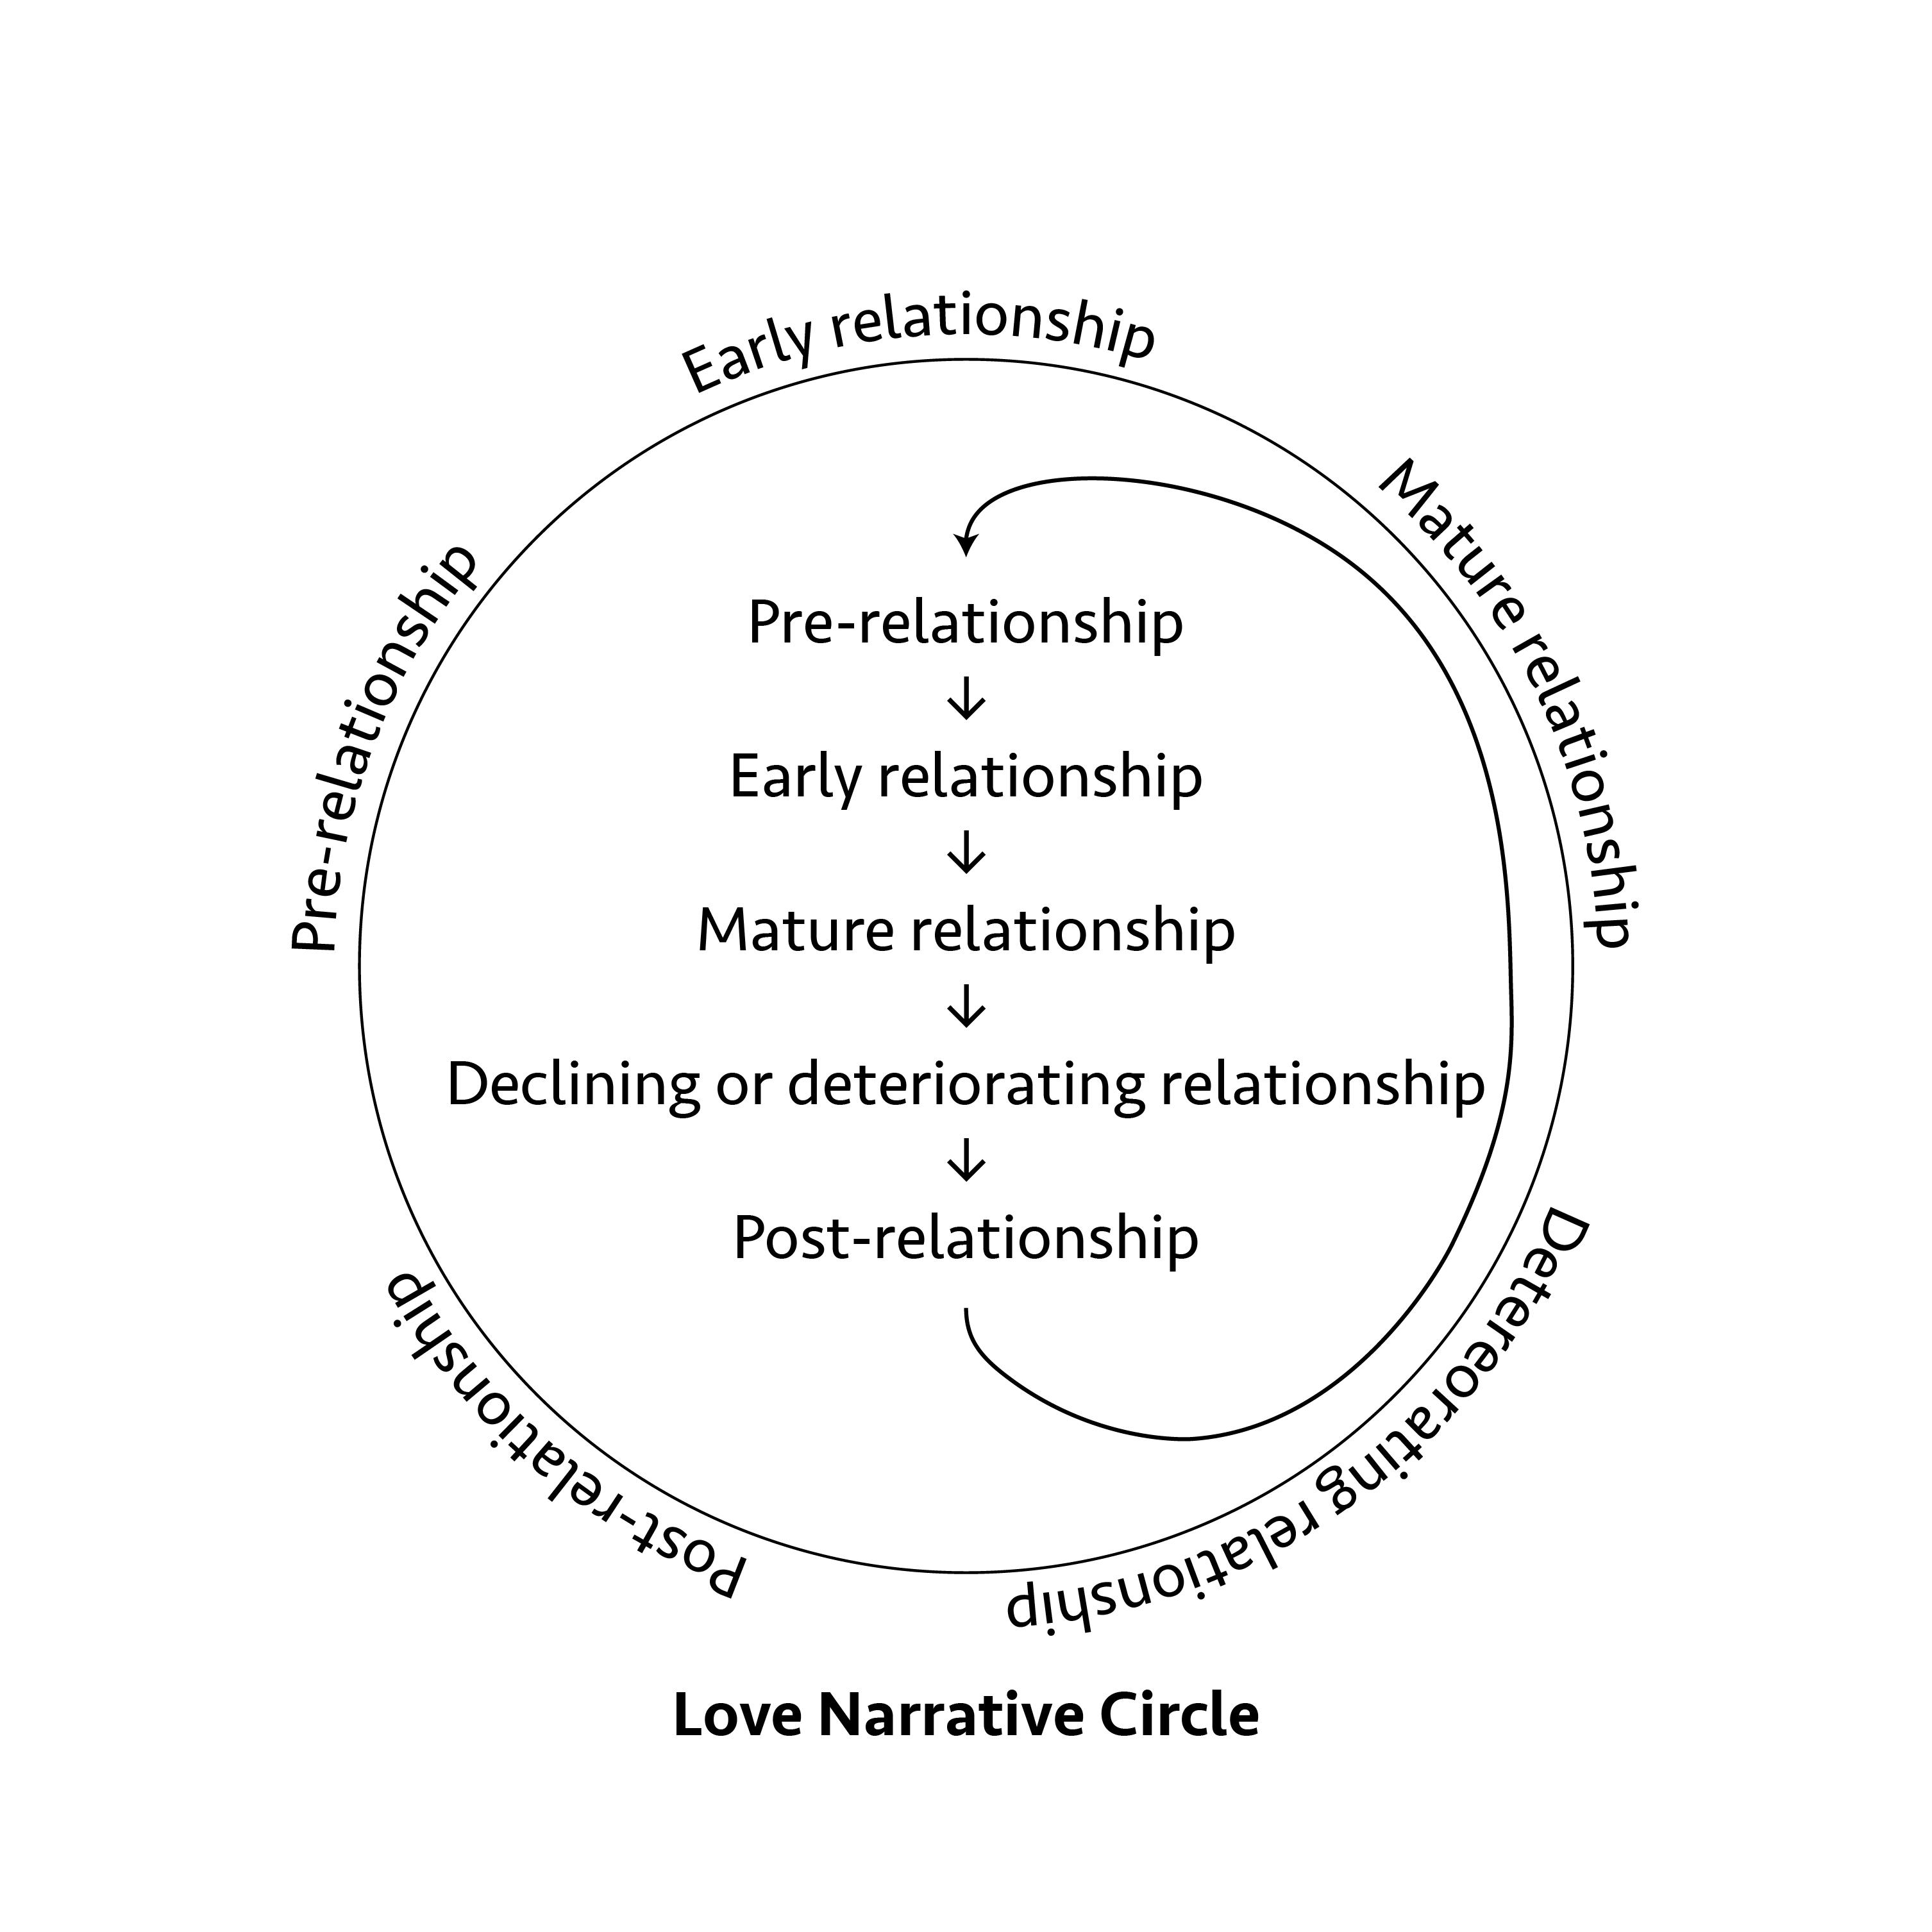 narrative-love-circle